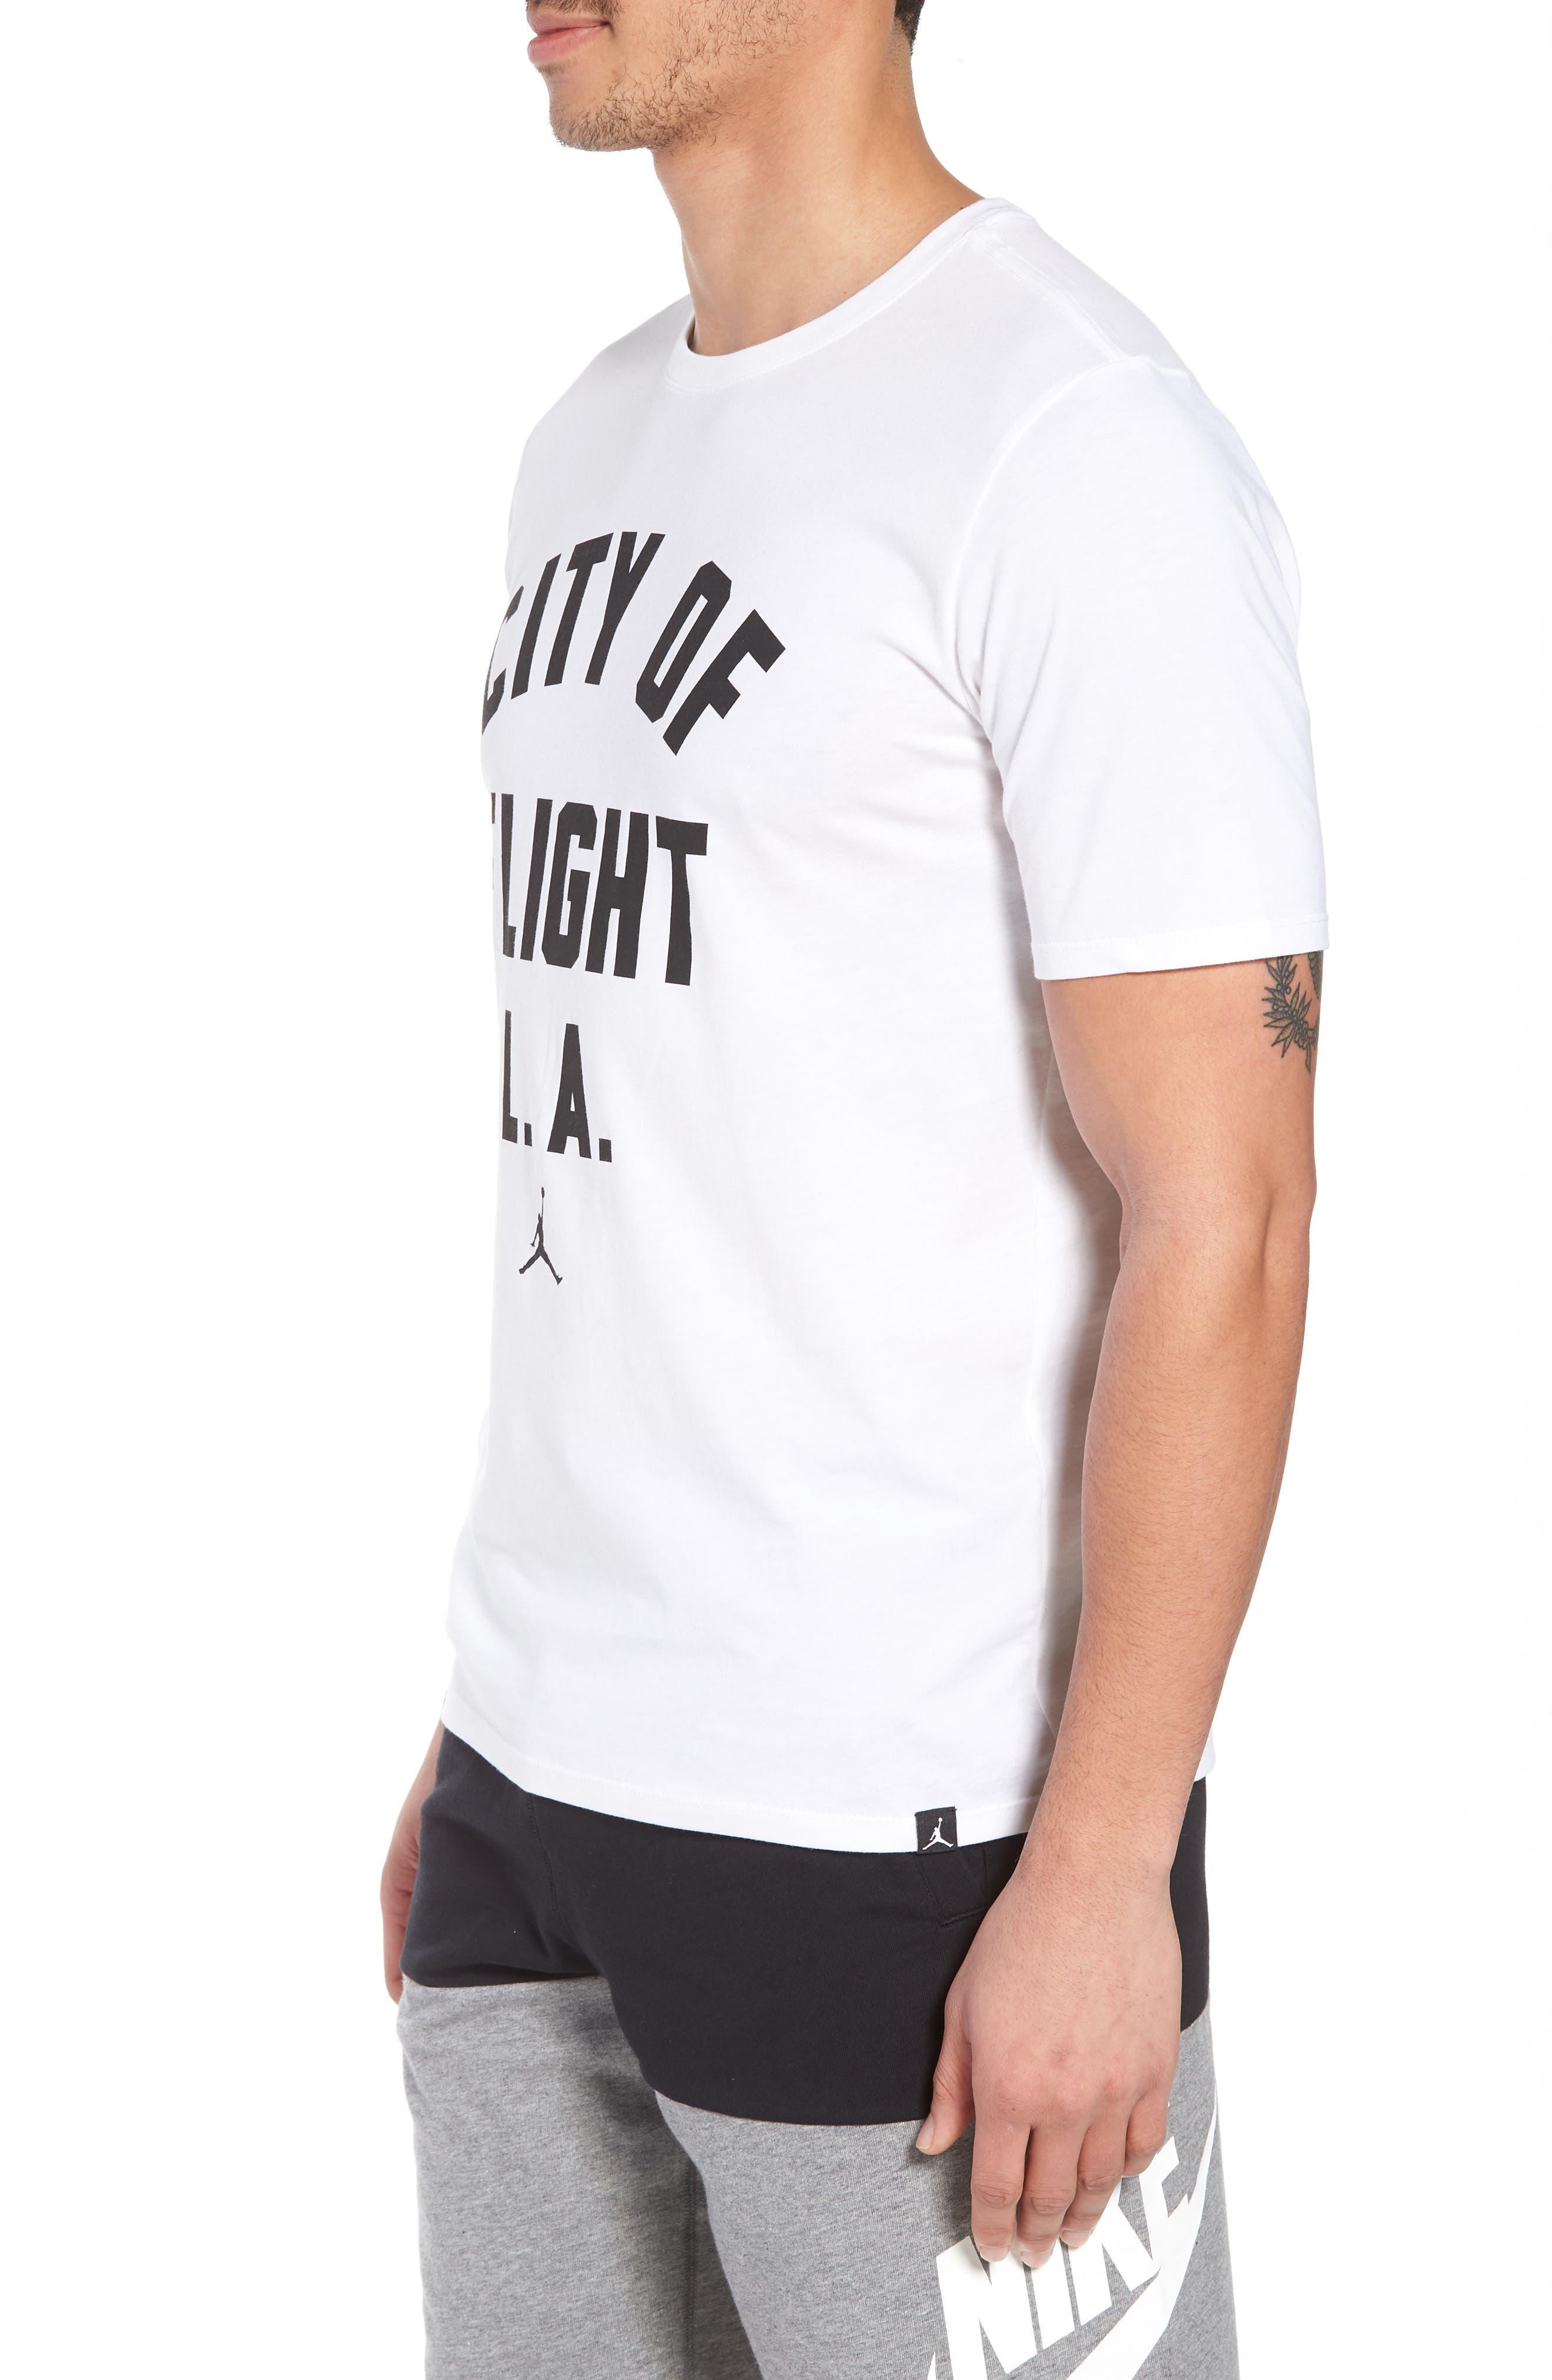 Sportswear City of Flight T-Shirt,                             Alternate thumbnail 8, color,